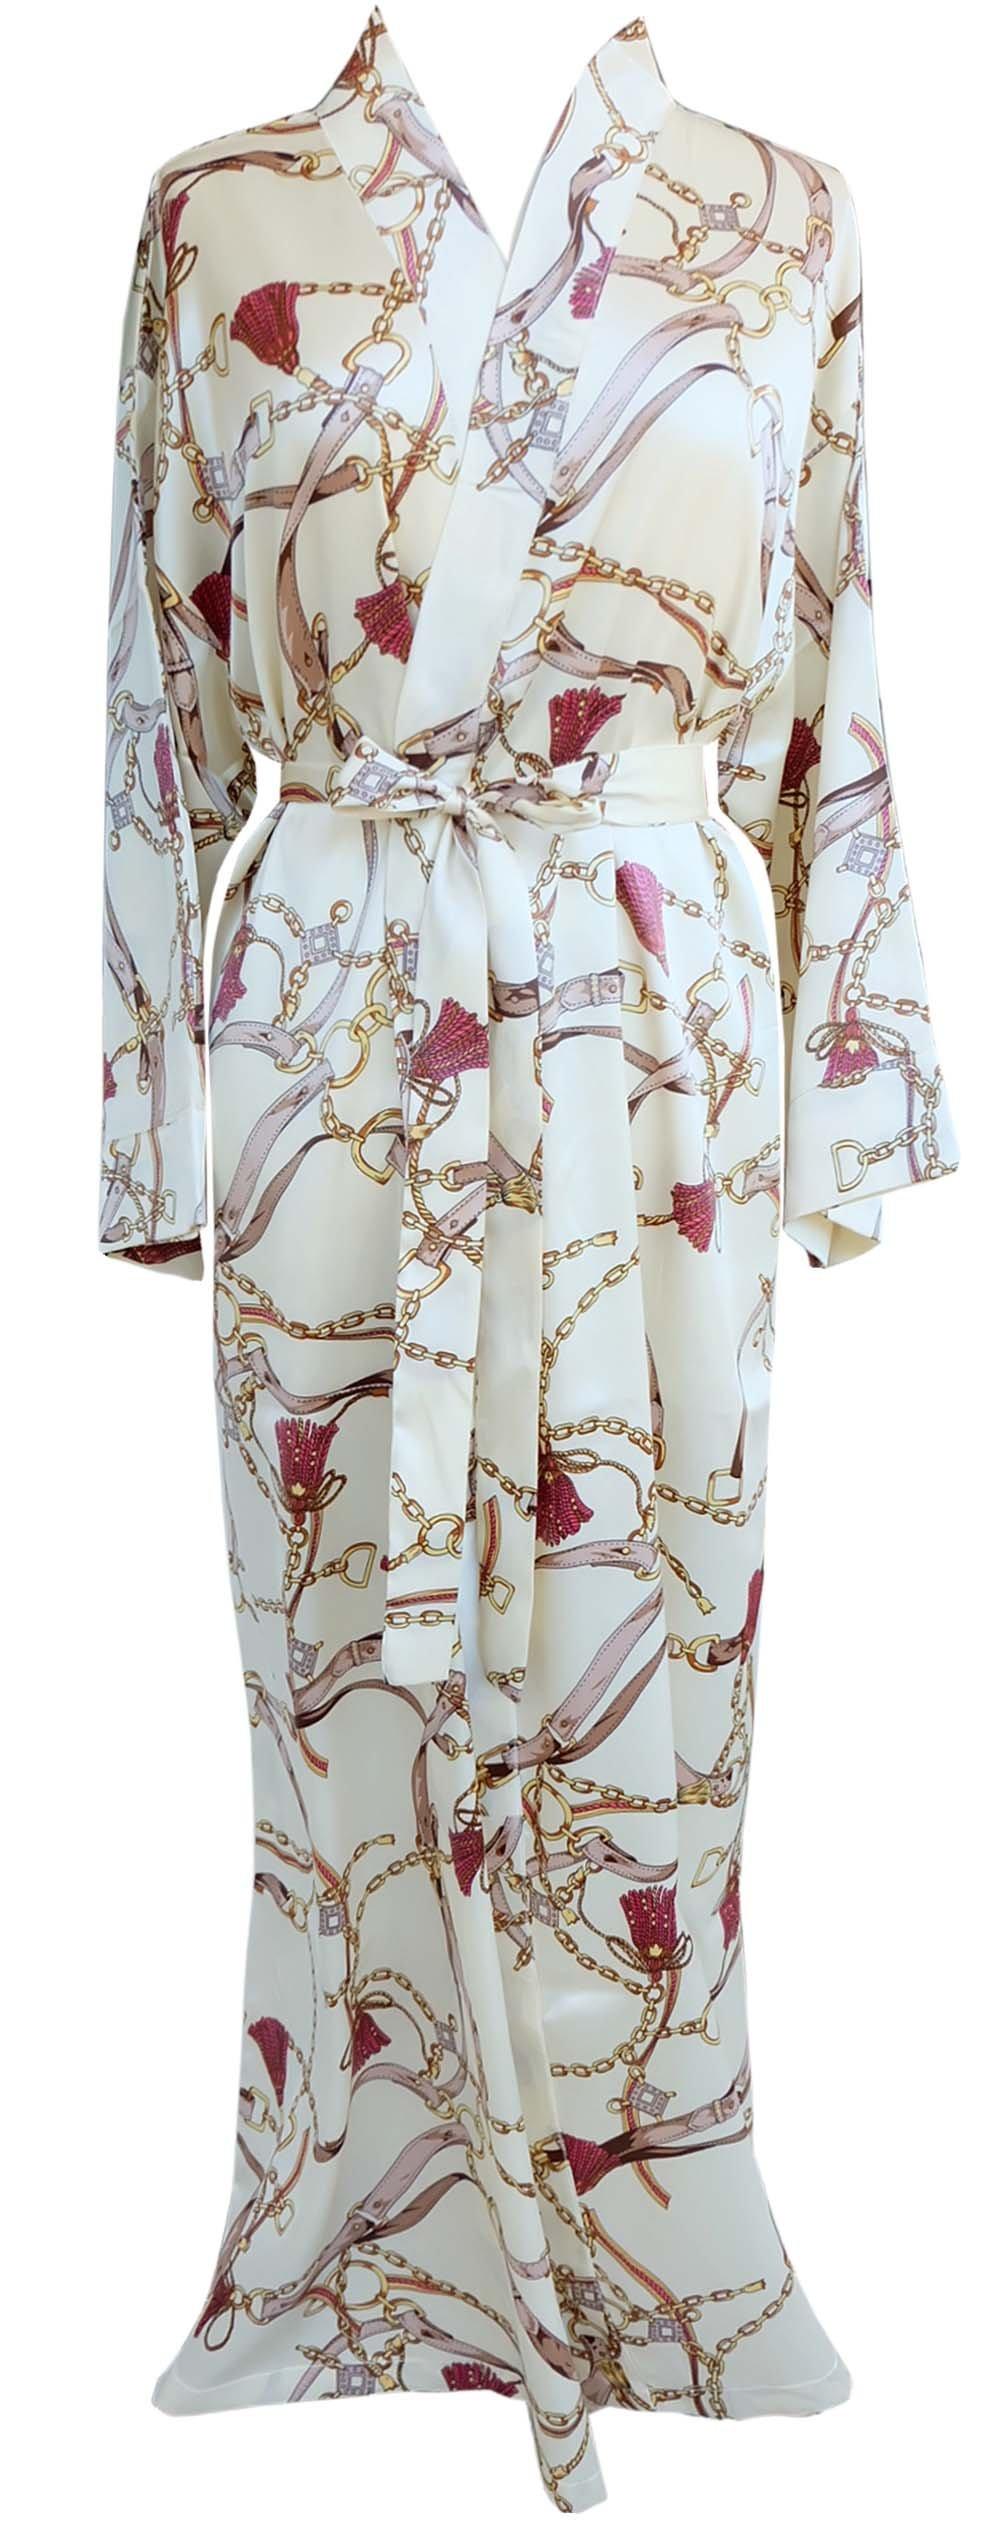 JANA JIRA Women's Long Ankle Length Robe for Women Plus Size Nightgowns, White/Cream, 2XL/3XL